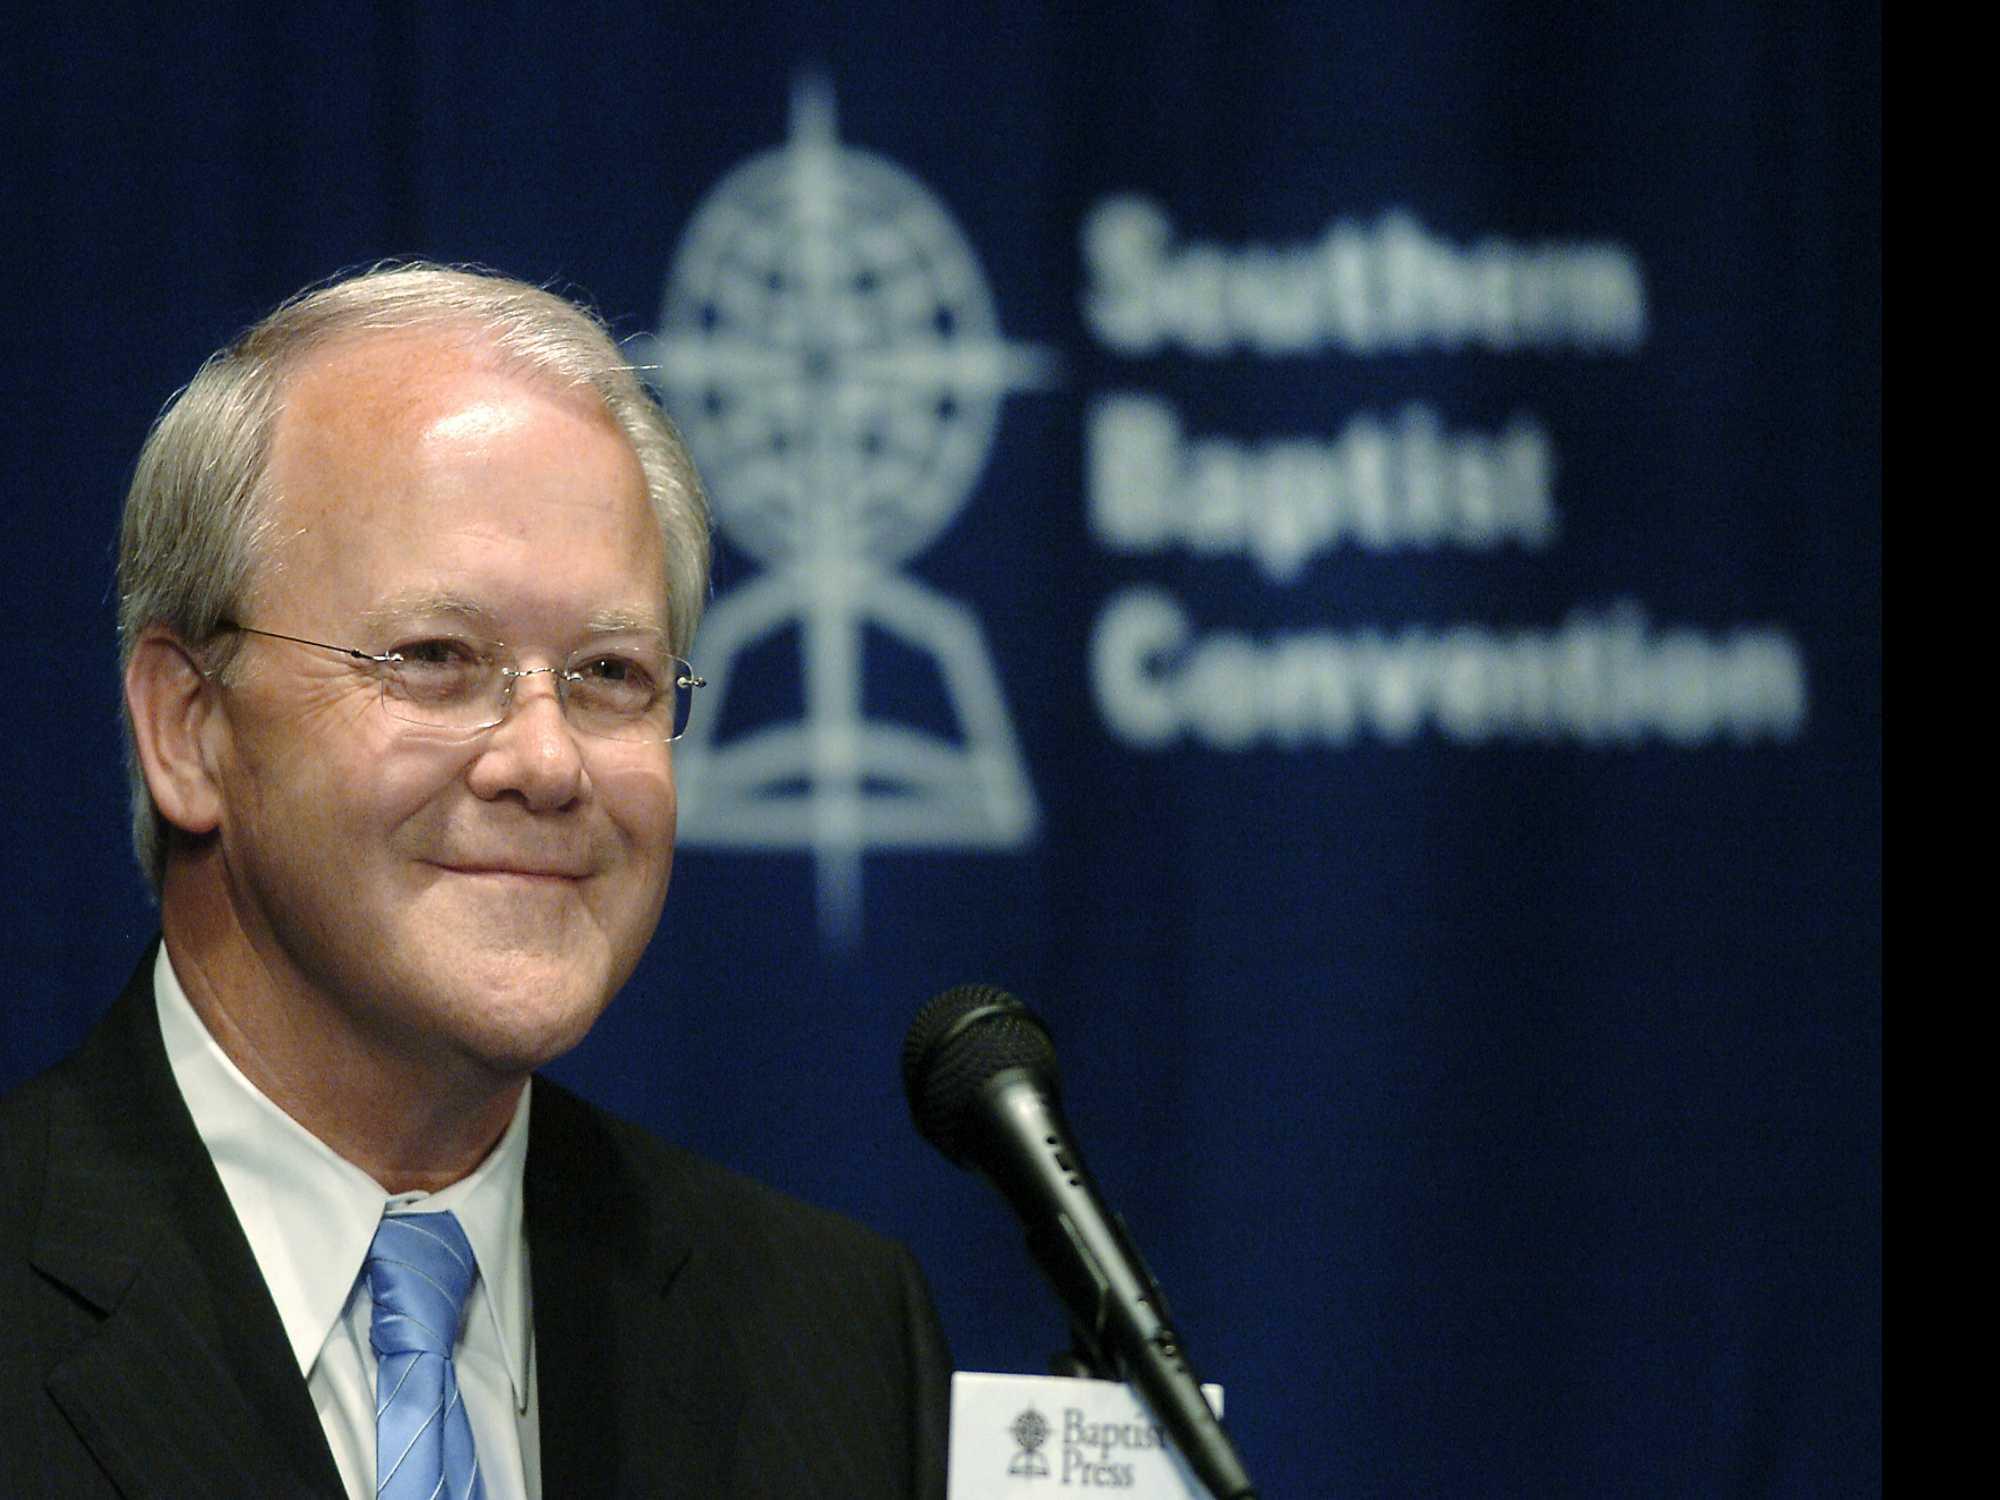 Southern Baptist Leader Resigns After 'Relationship'